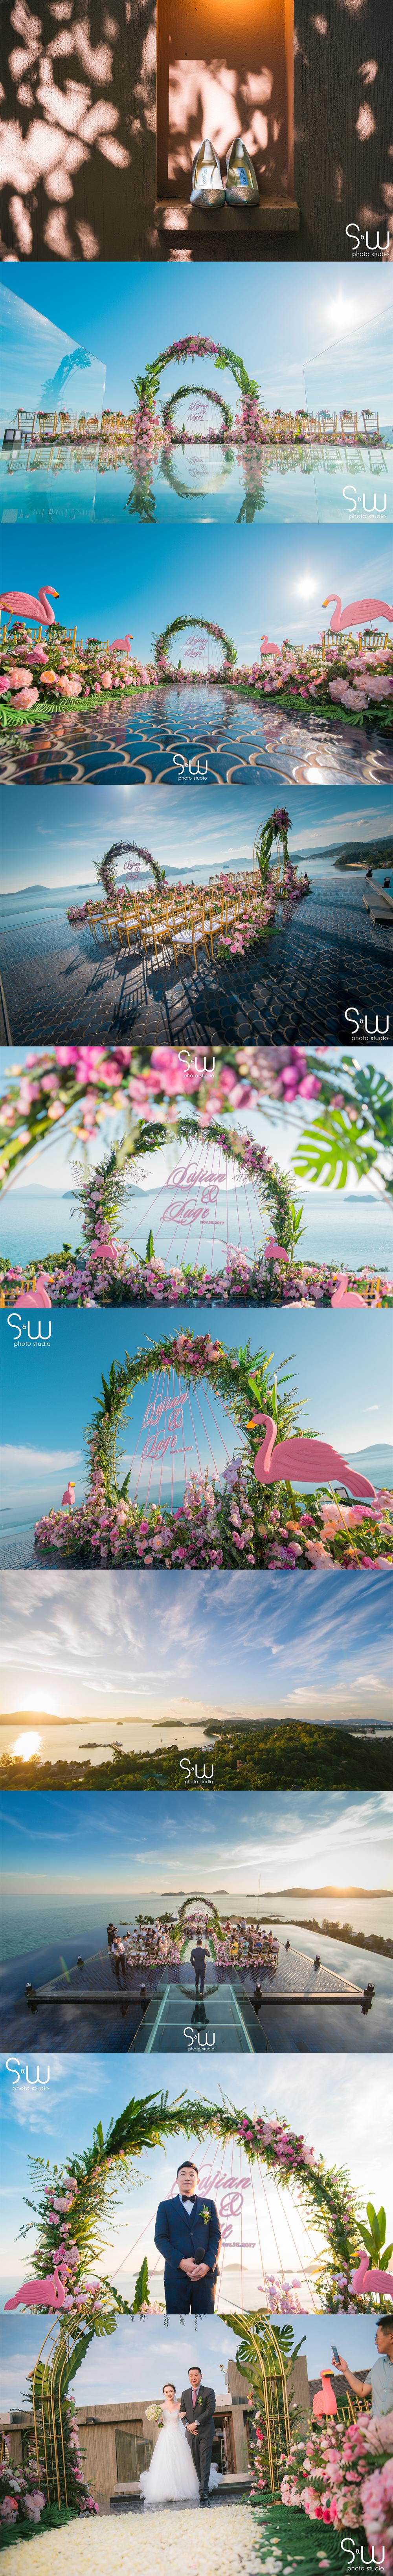 WEDDING | Trisara , Phuket(普吉島) | sw photo studio 婚禮, 婚攝, 婚紗, 海外婚禮, 海外婚紗, 海島婚禮,峇里島婚禮, 峇里島婚紗, 台灣婚禮, 婚攝推薦